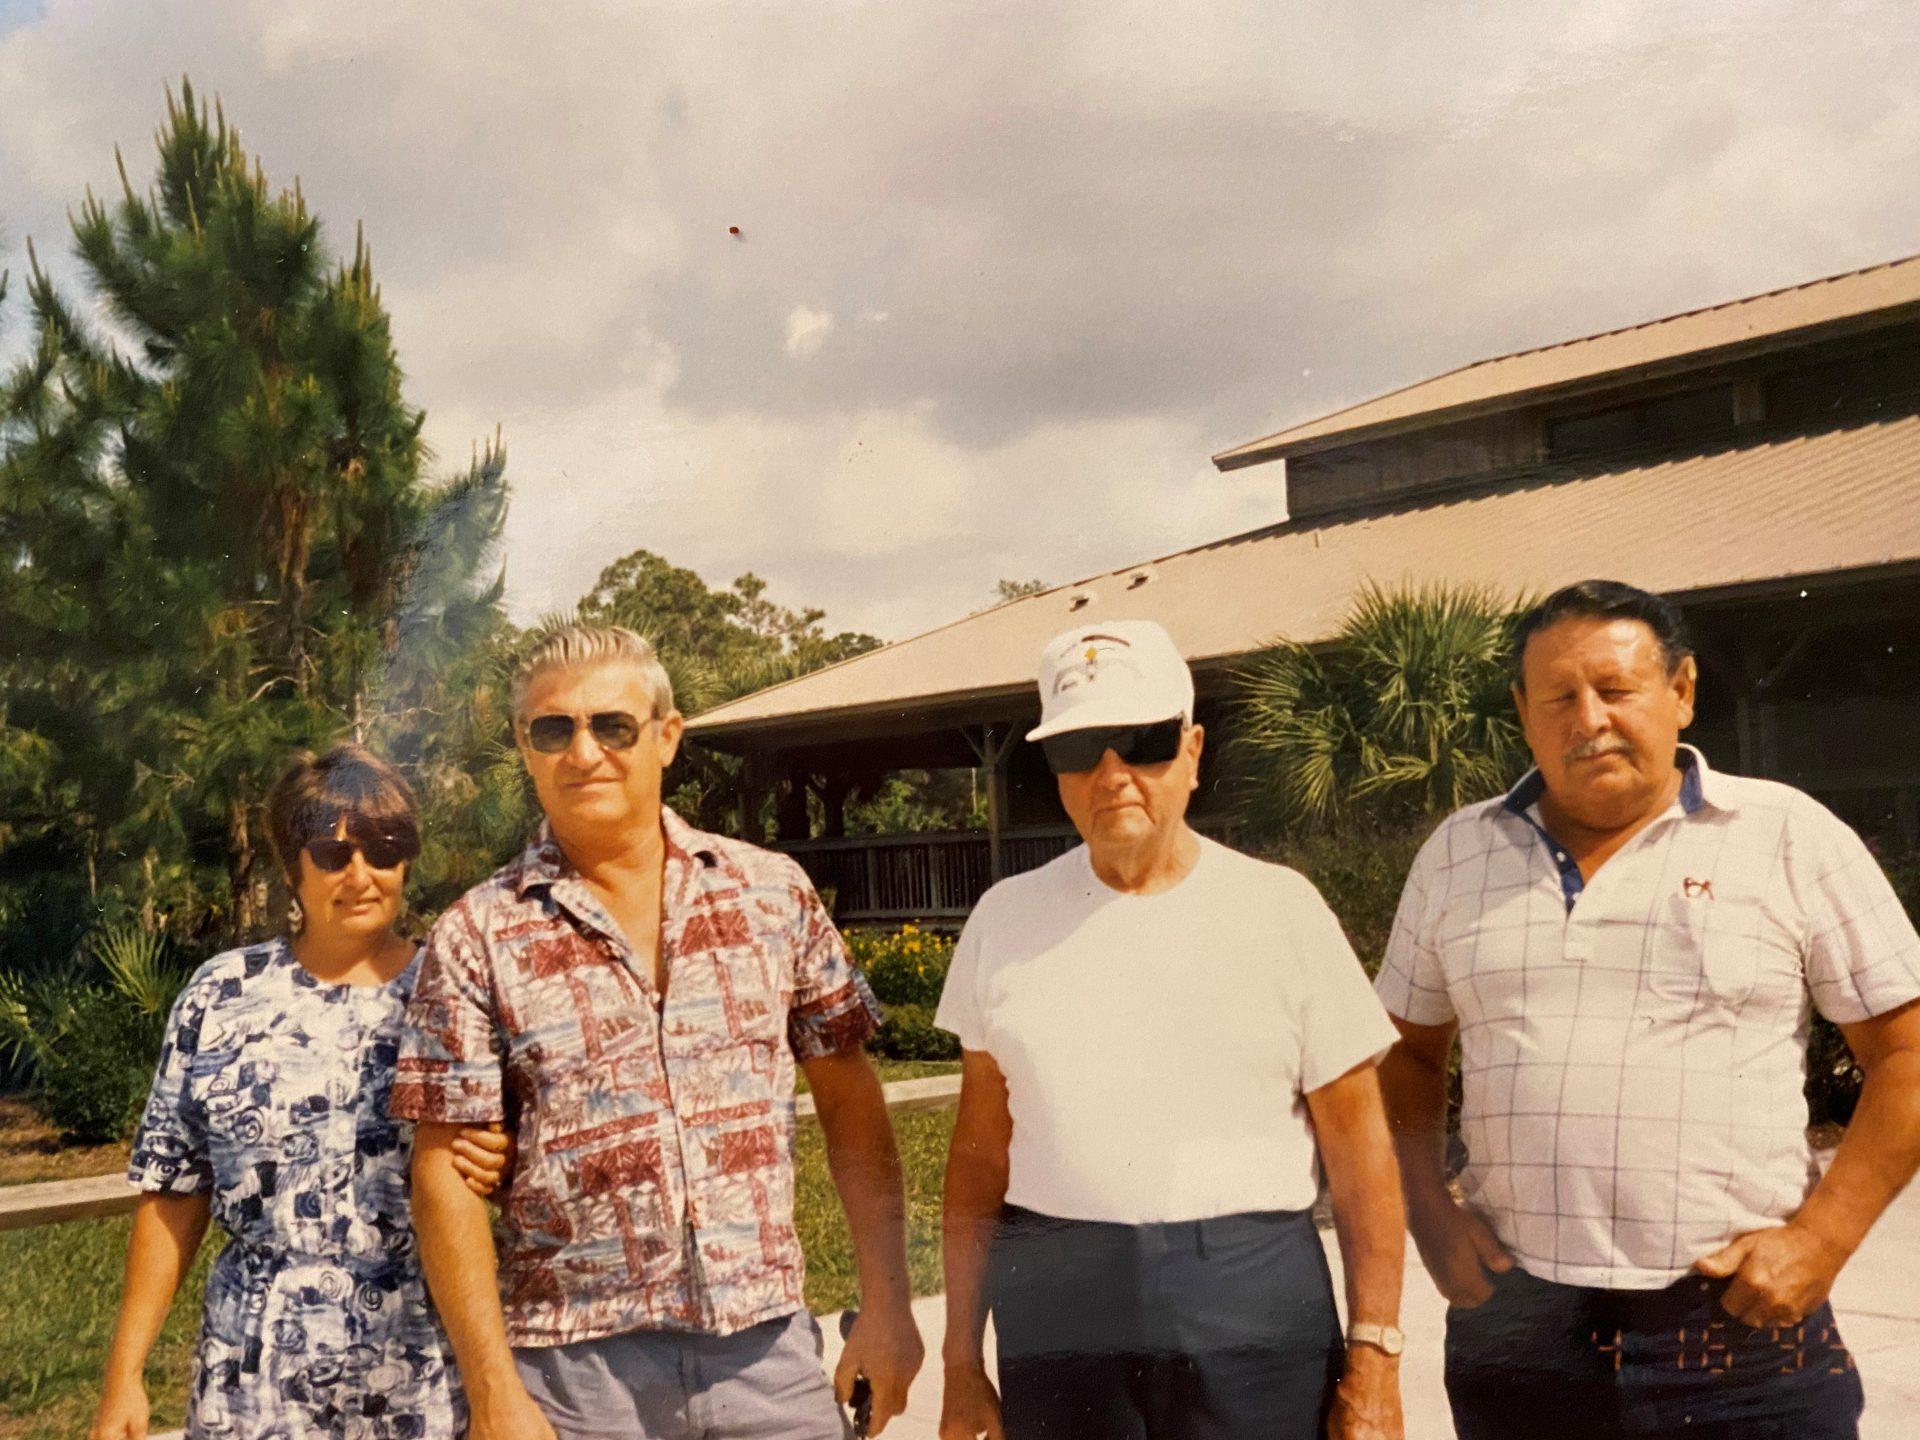 Jackie Simpson Hollman, AJ Hollman, John Simpson, Bobby Simpson